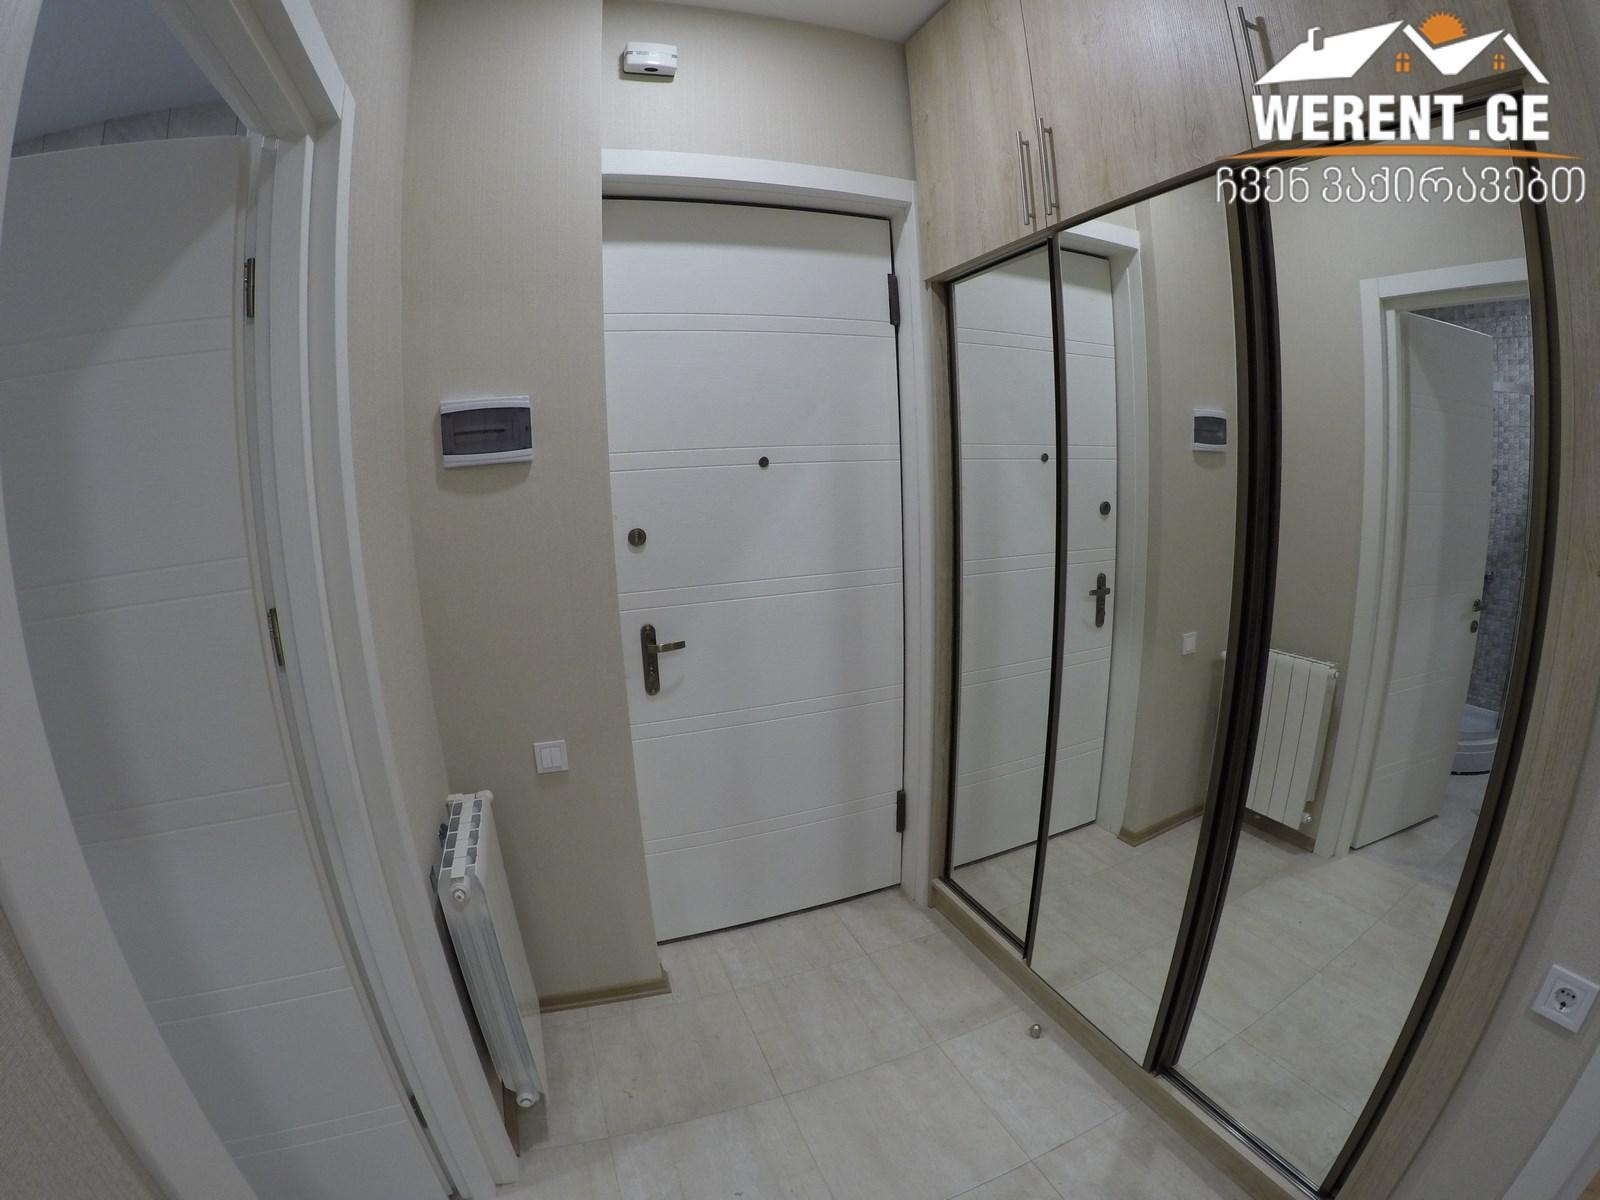 Сдается 2-комнатная квартира в Тбилиси, на Сабуртало, в Axis palace 2